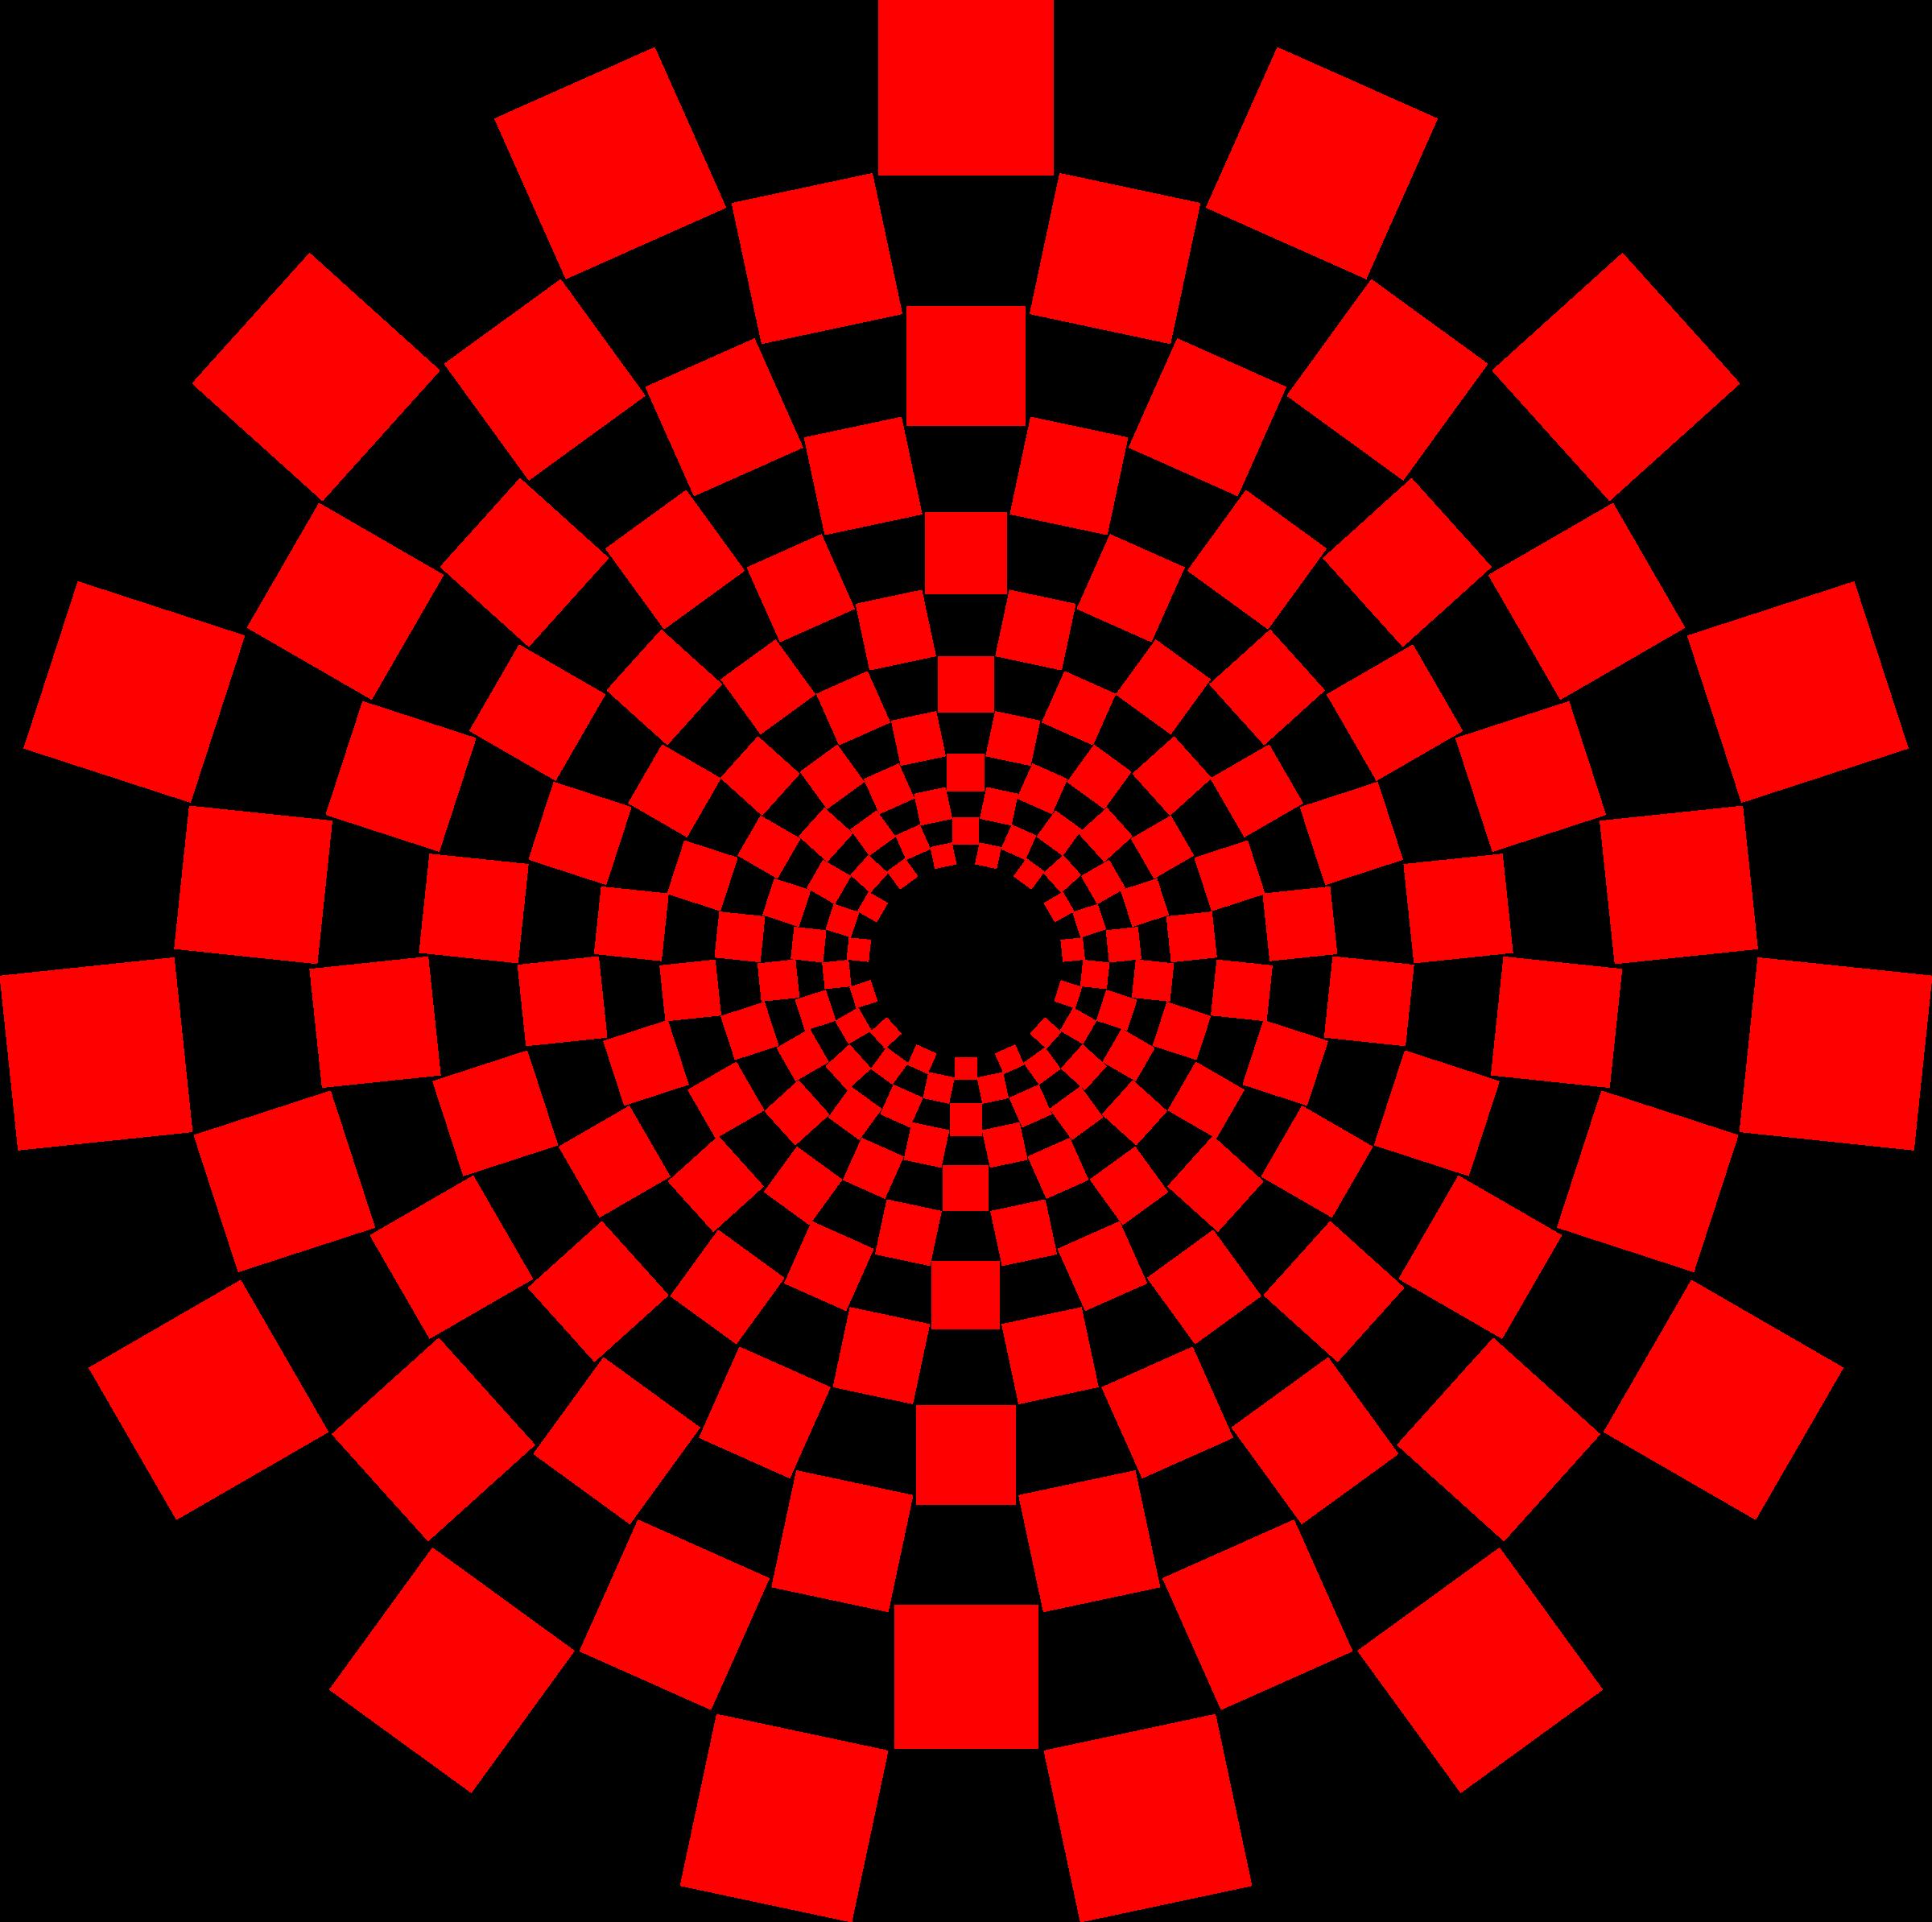 Illusion clipart optical illusion Spiral Spiral Optical Illusion Clipart